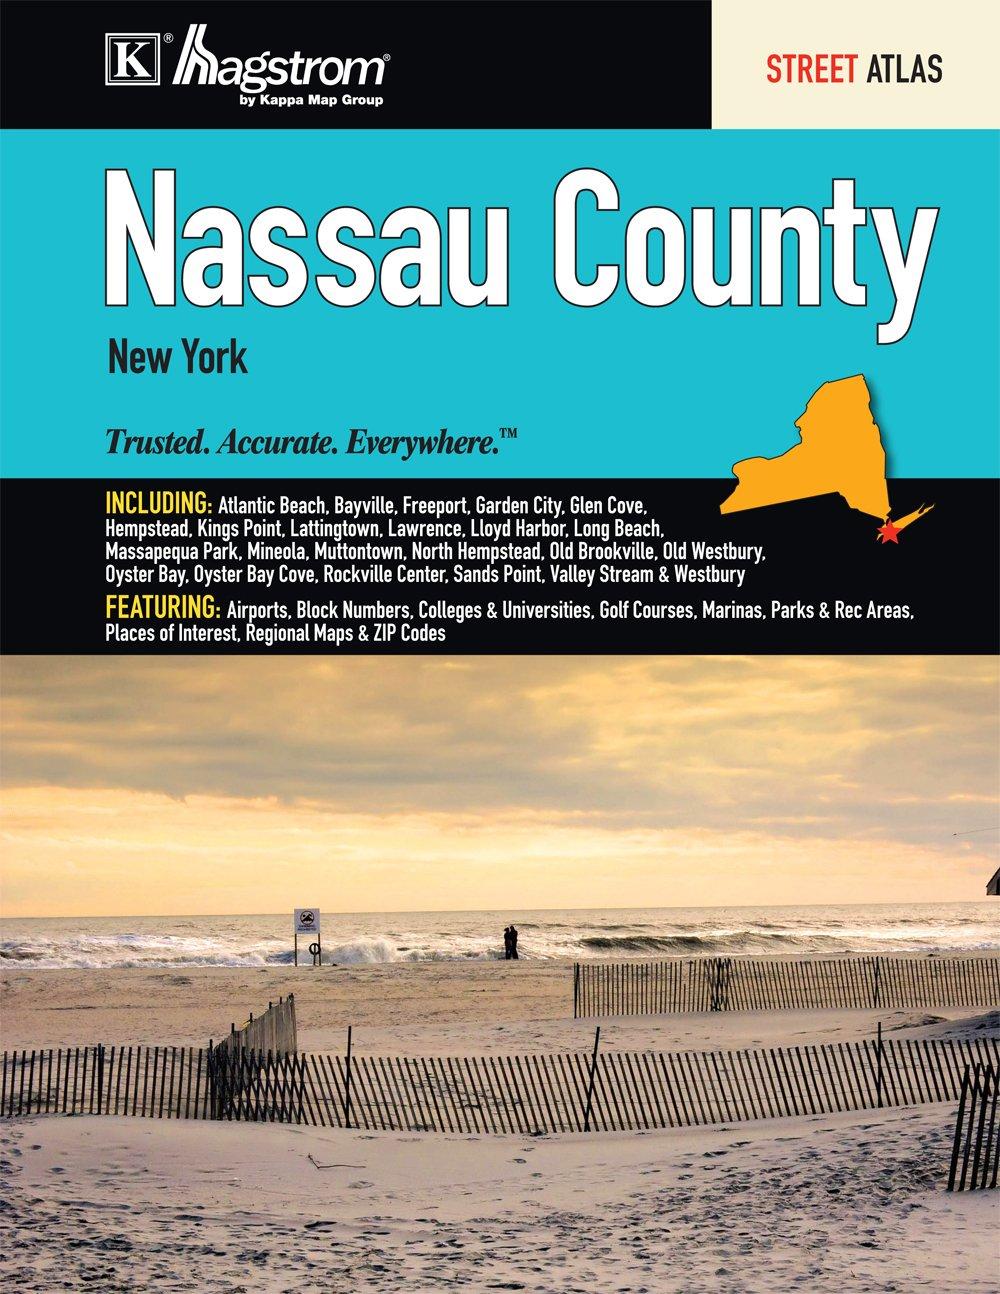 Nassau County Ny Street Atlas Kappa Map Group 9780762585144